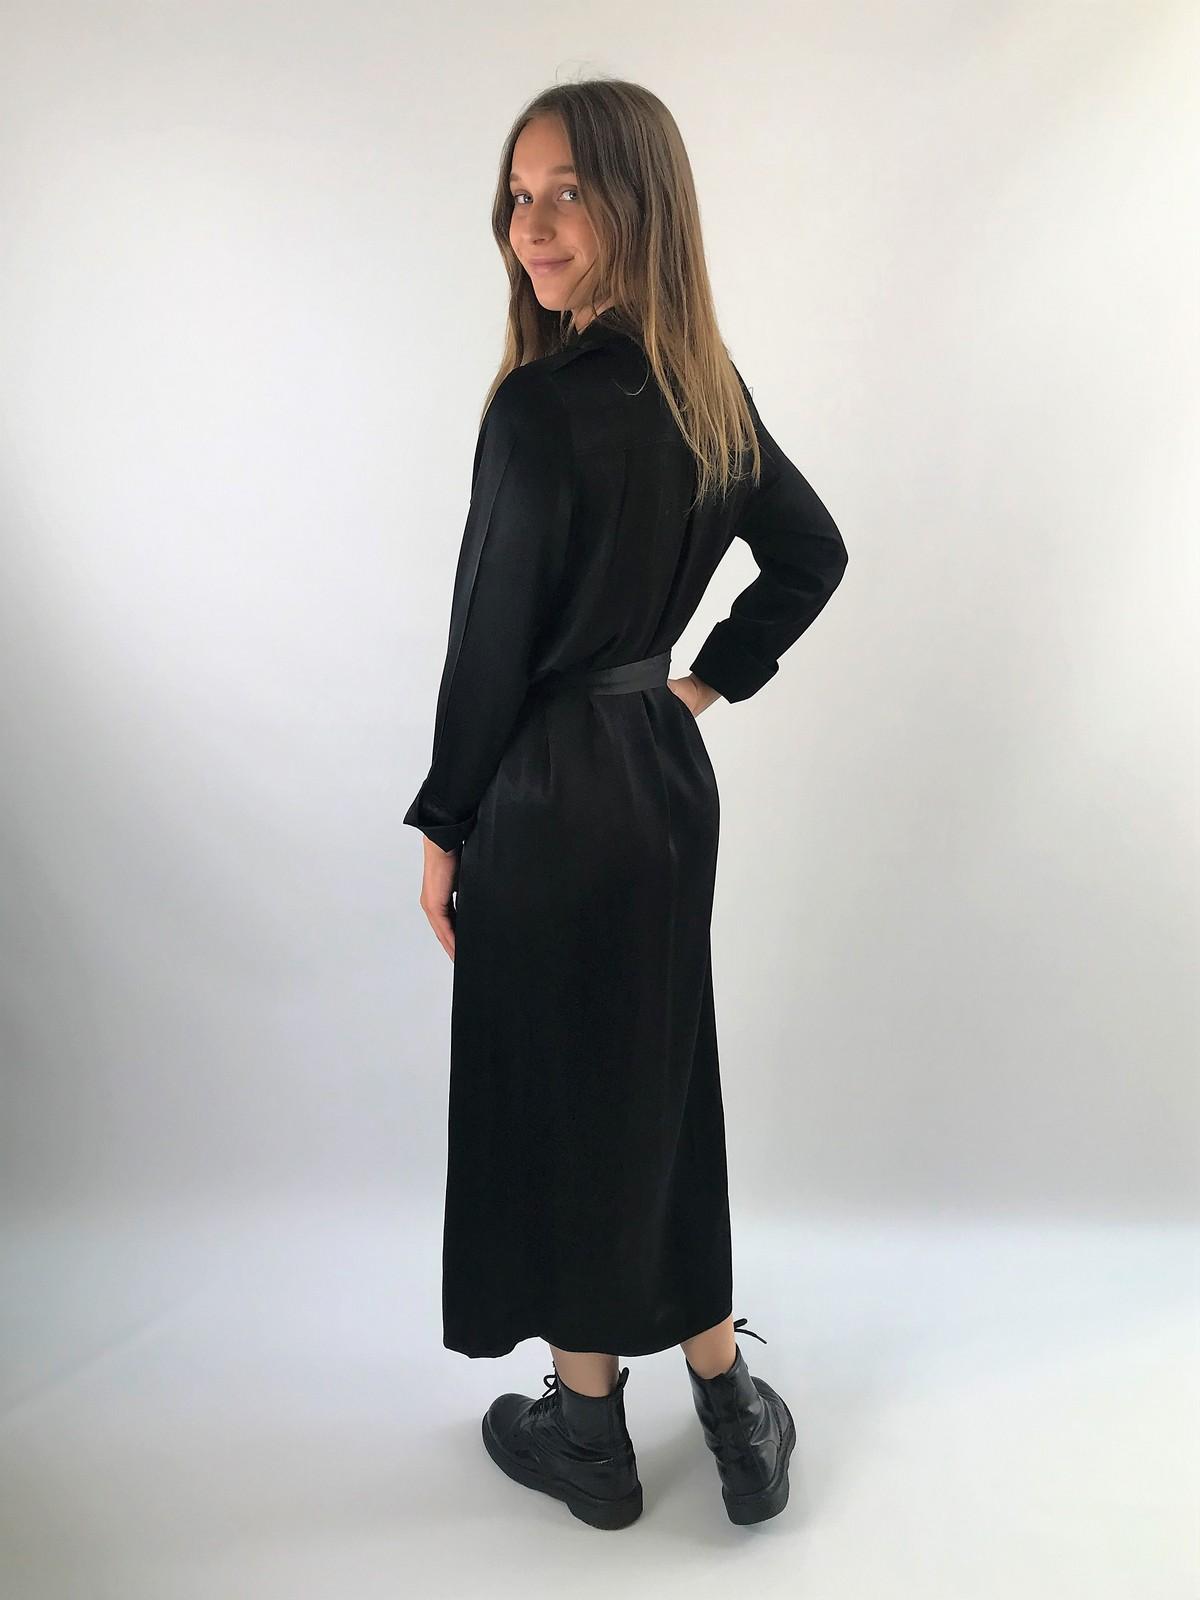 Justeve - Jane Calvin - zwart